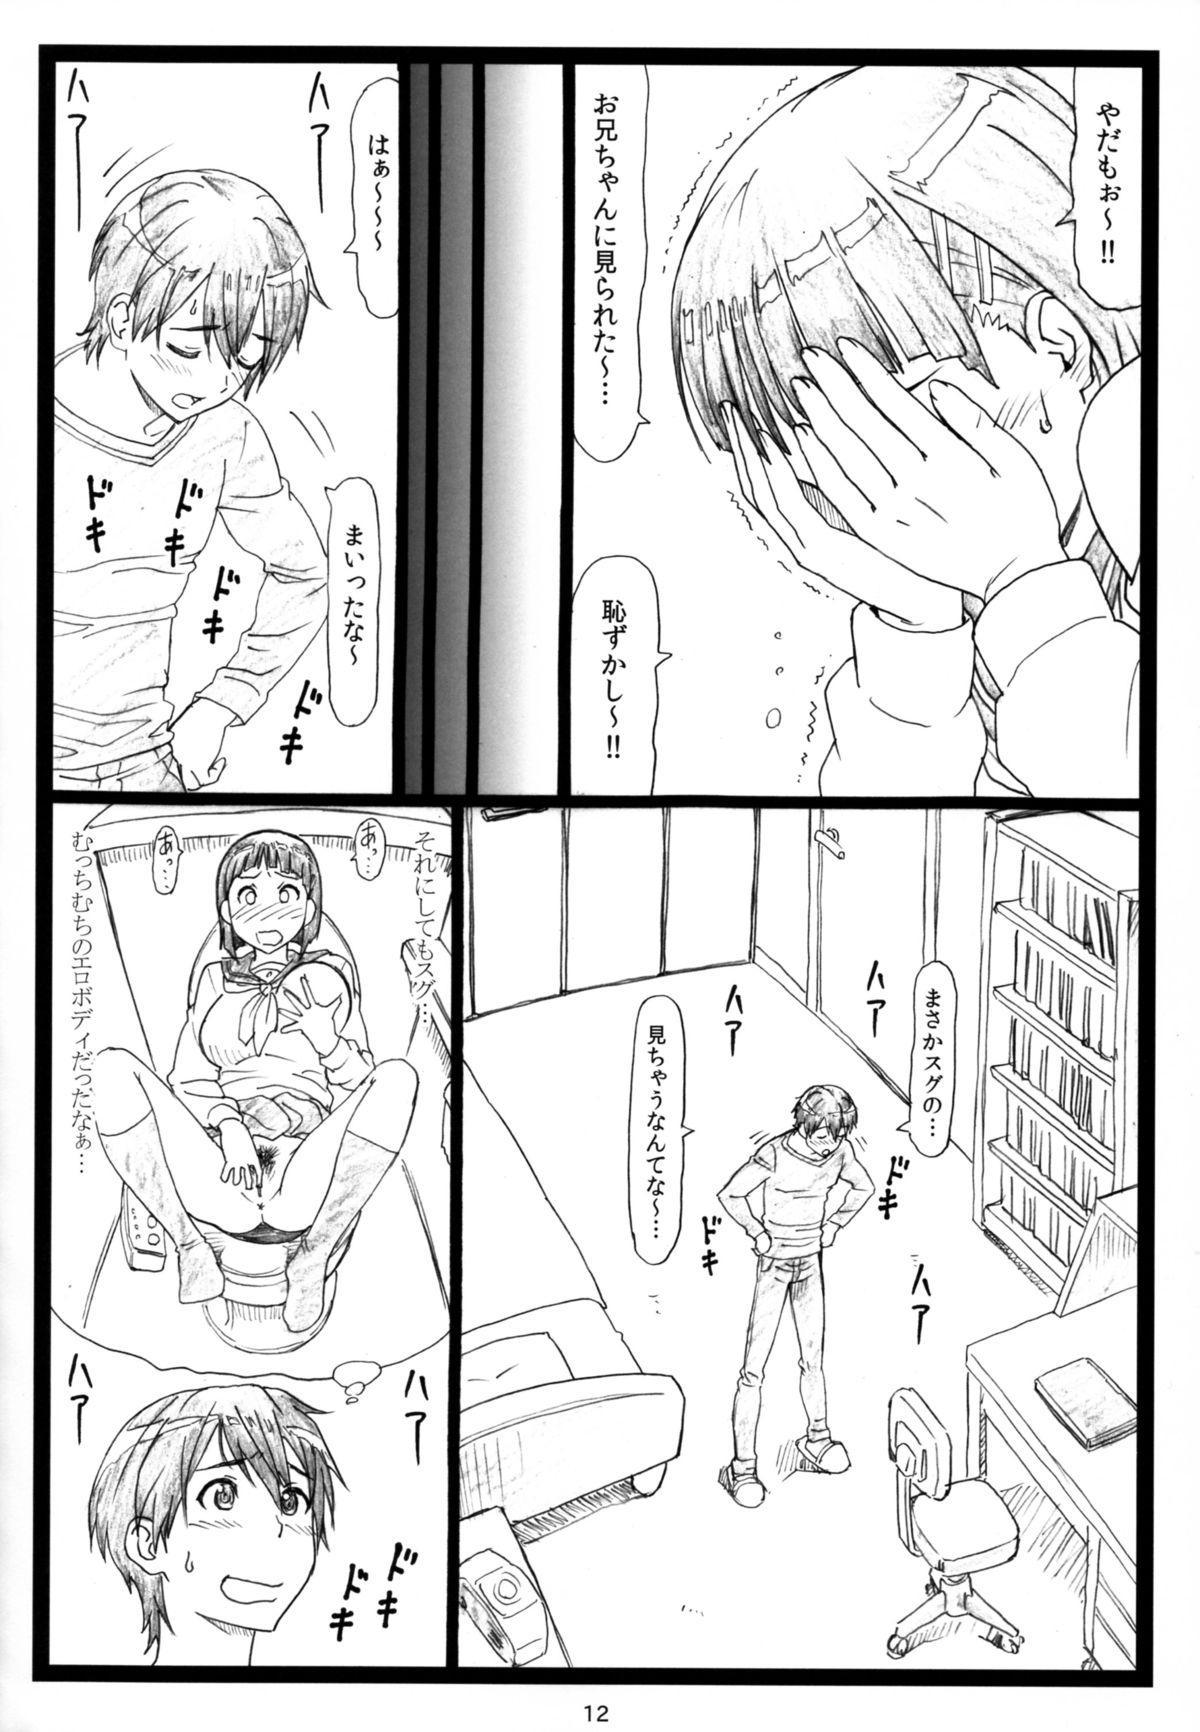 Kuzuha 11